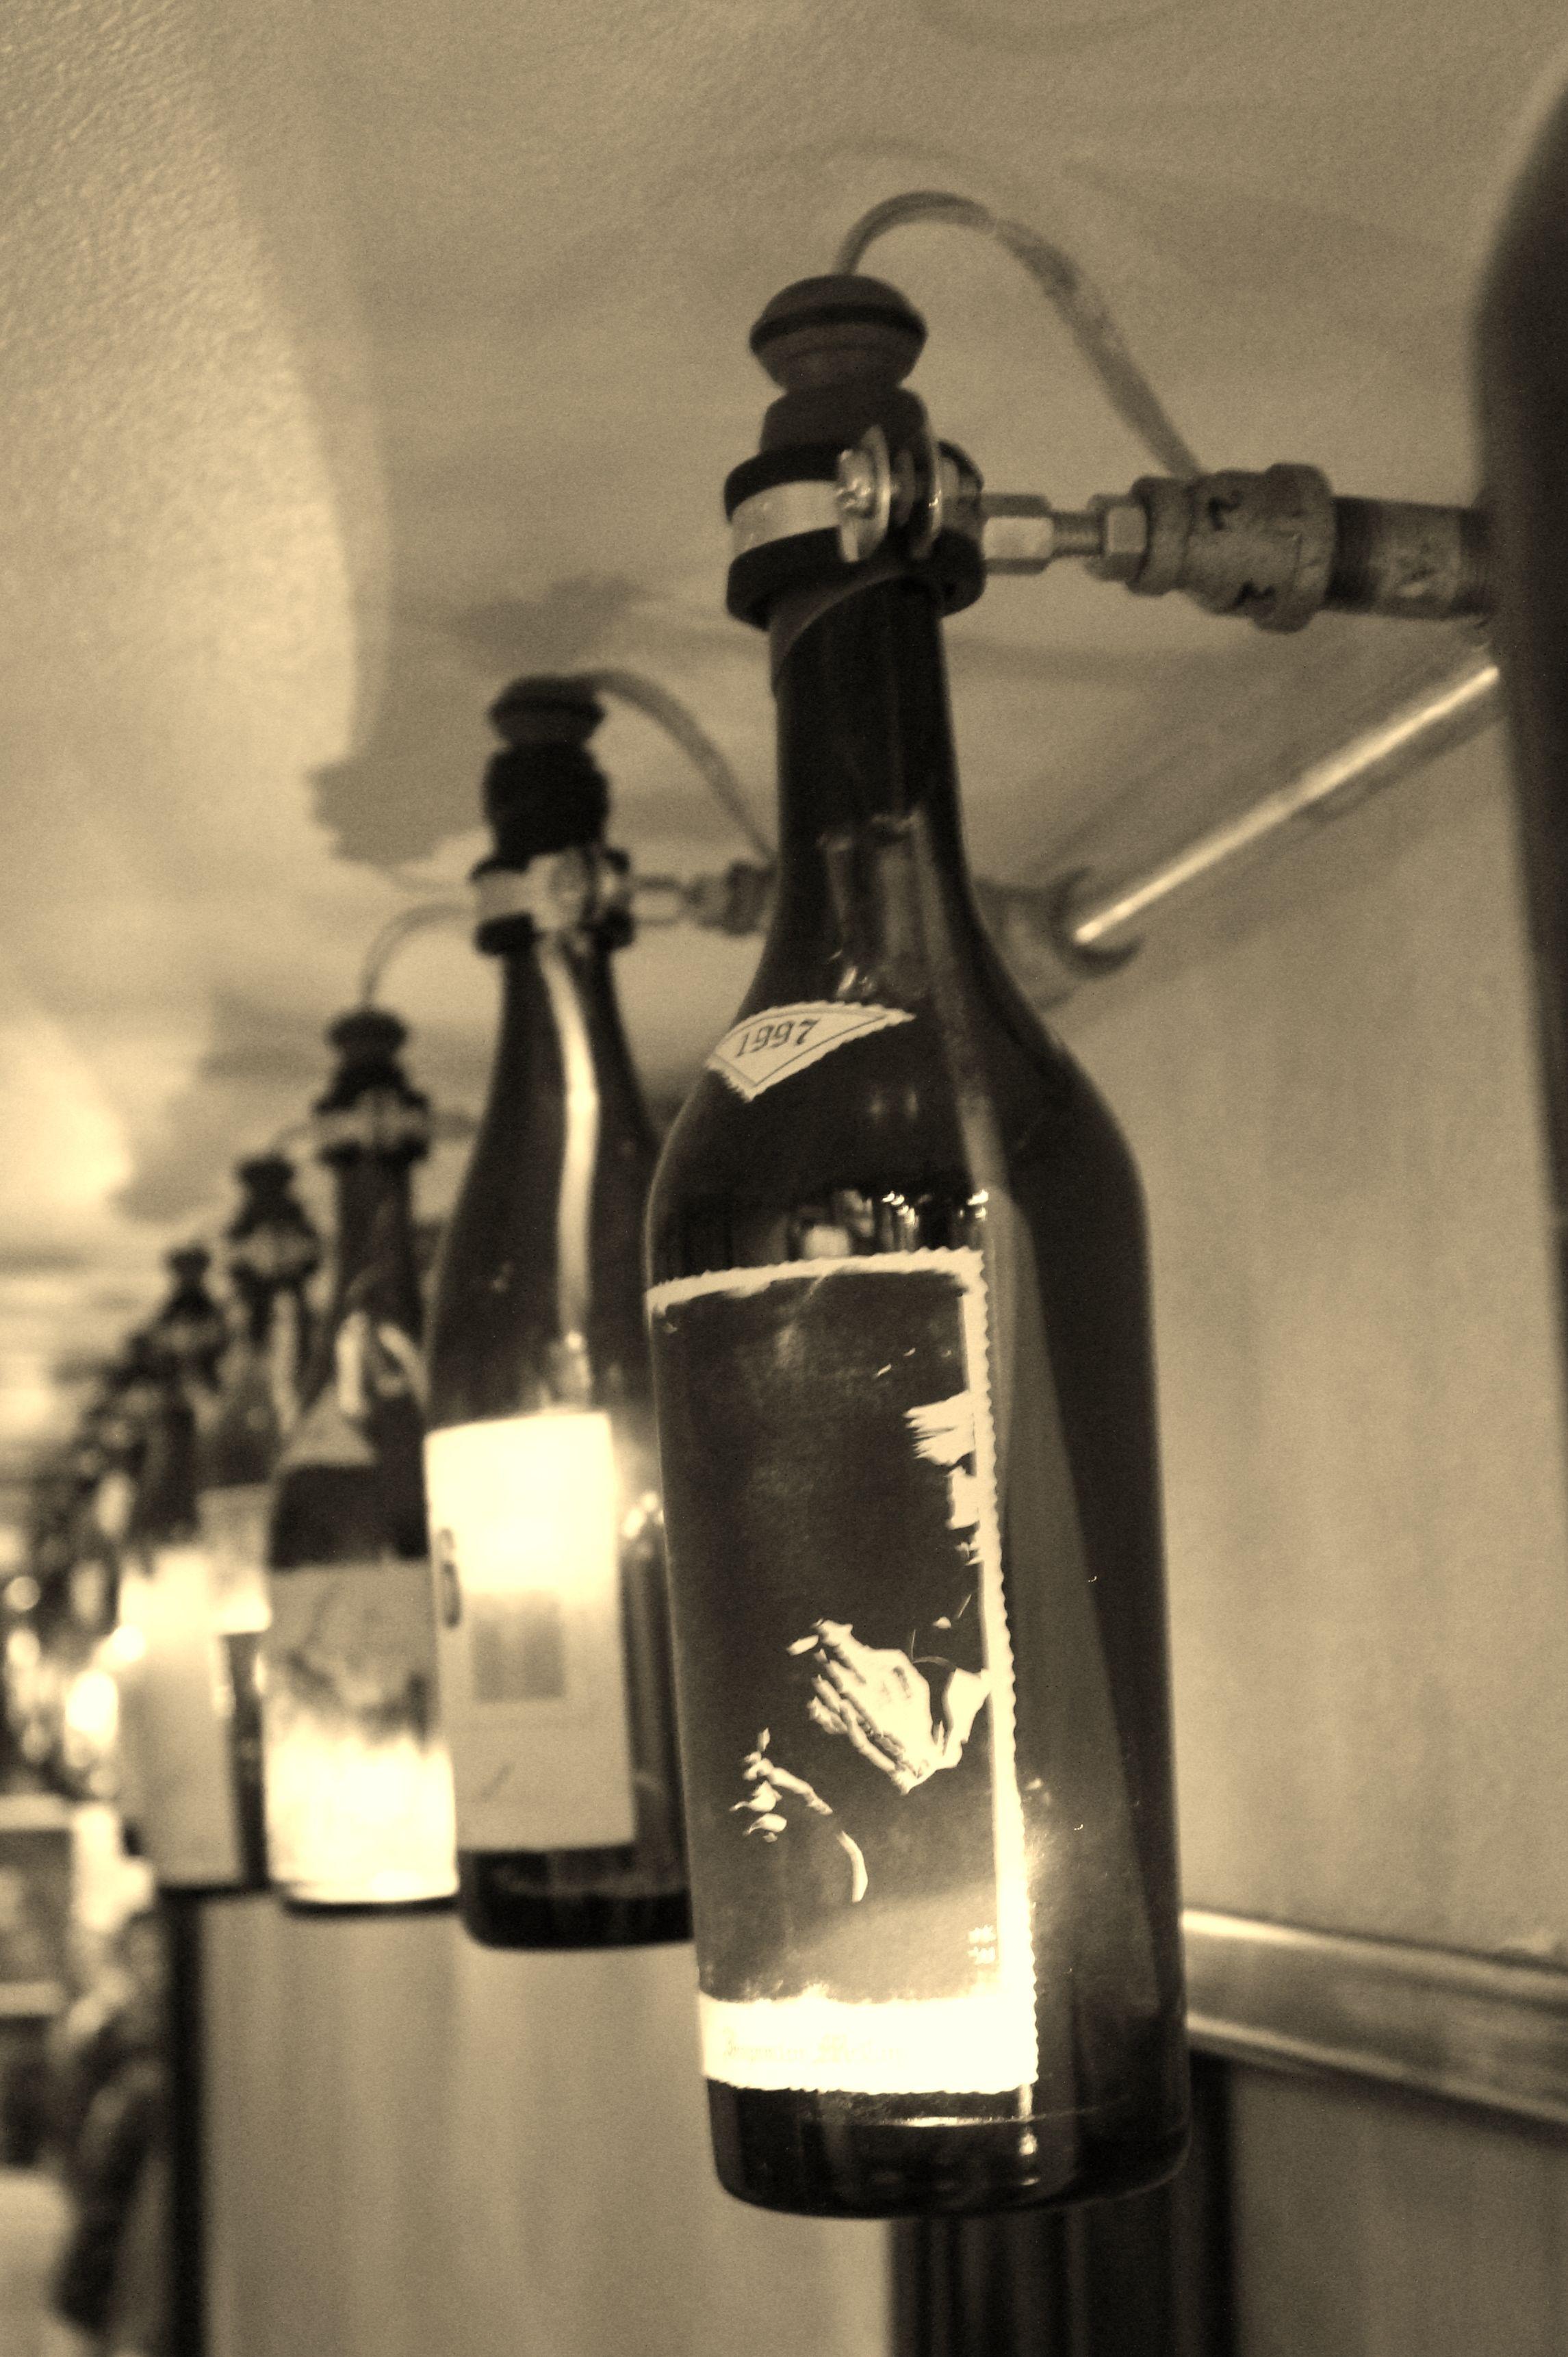 wine bottle lighting. Wine Bottle Lights Lighting